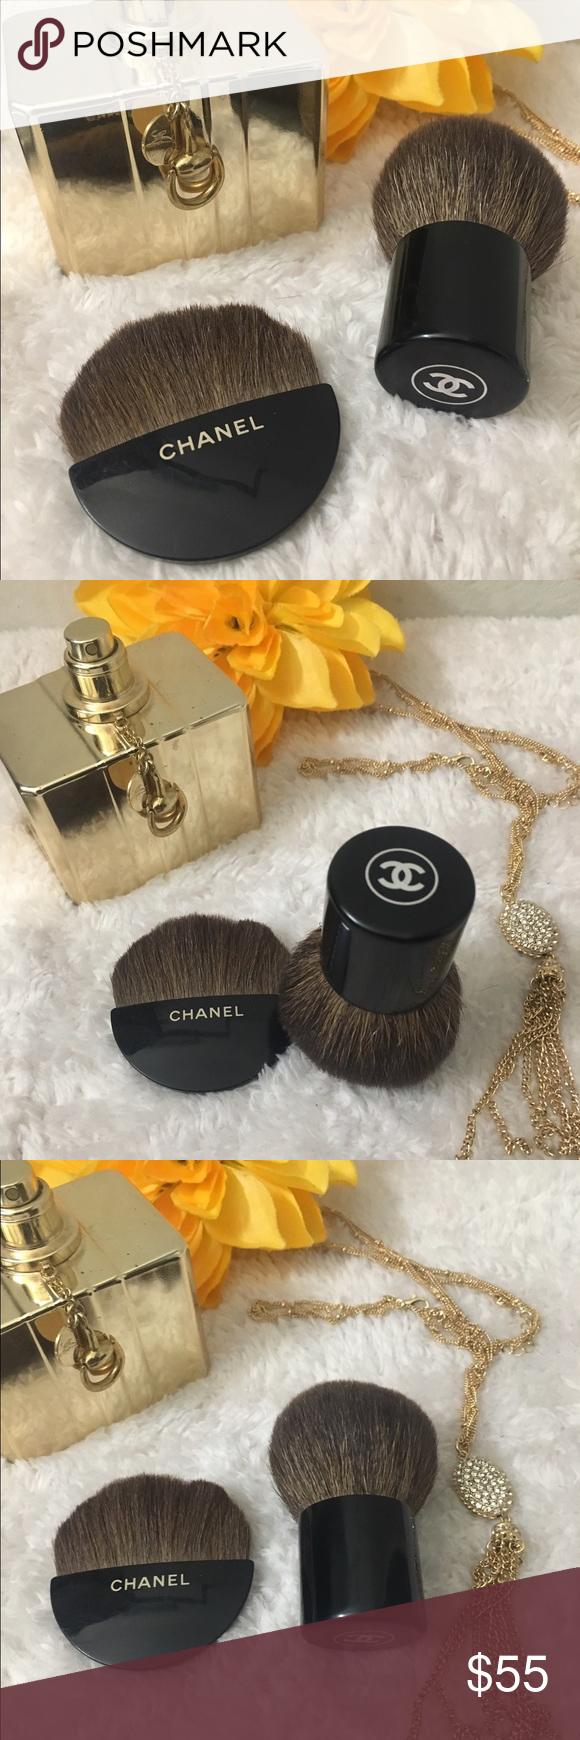 Chanel authentic brush bundle set Chanel brushes, Chanel